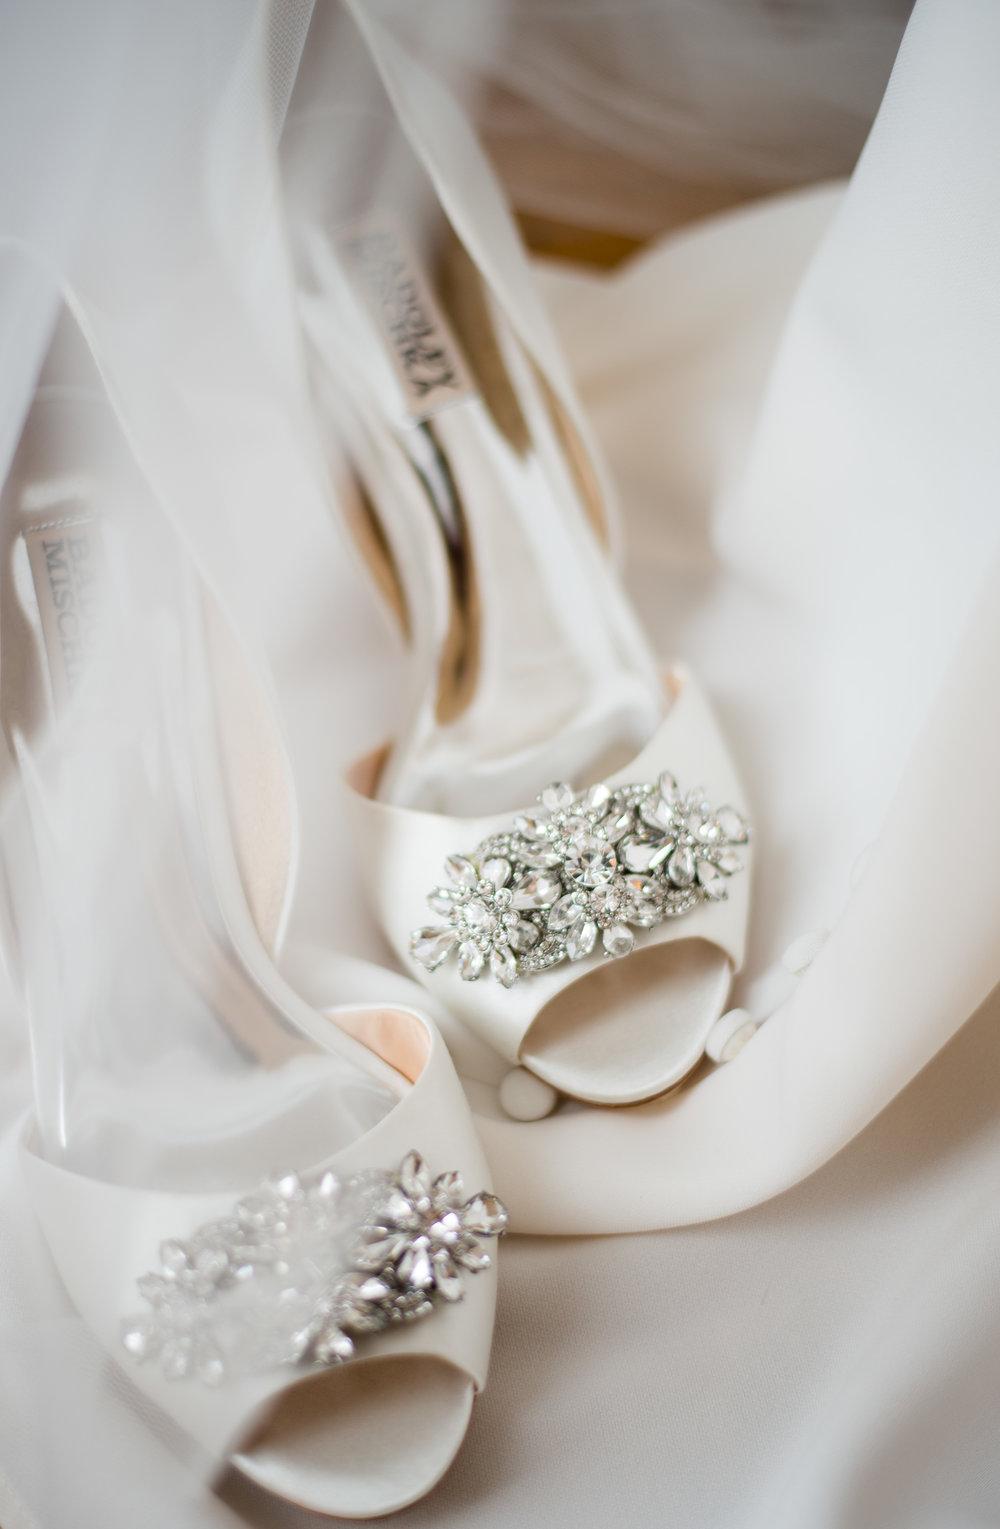 AN ELEGANT SPRING WEDDING AT THE DEWBERRY